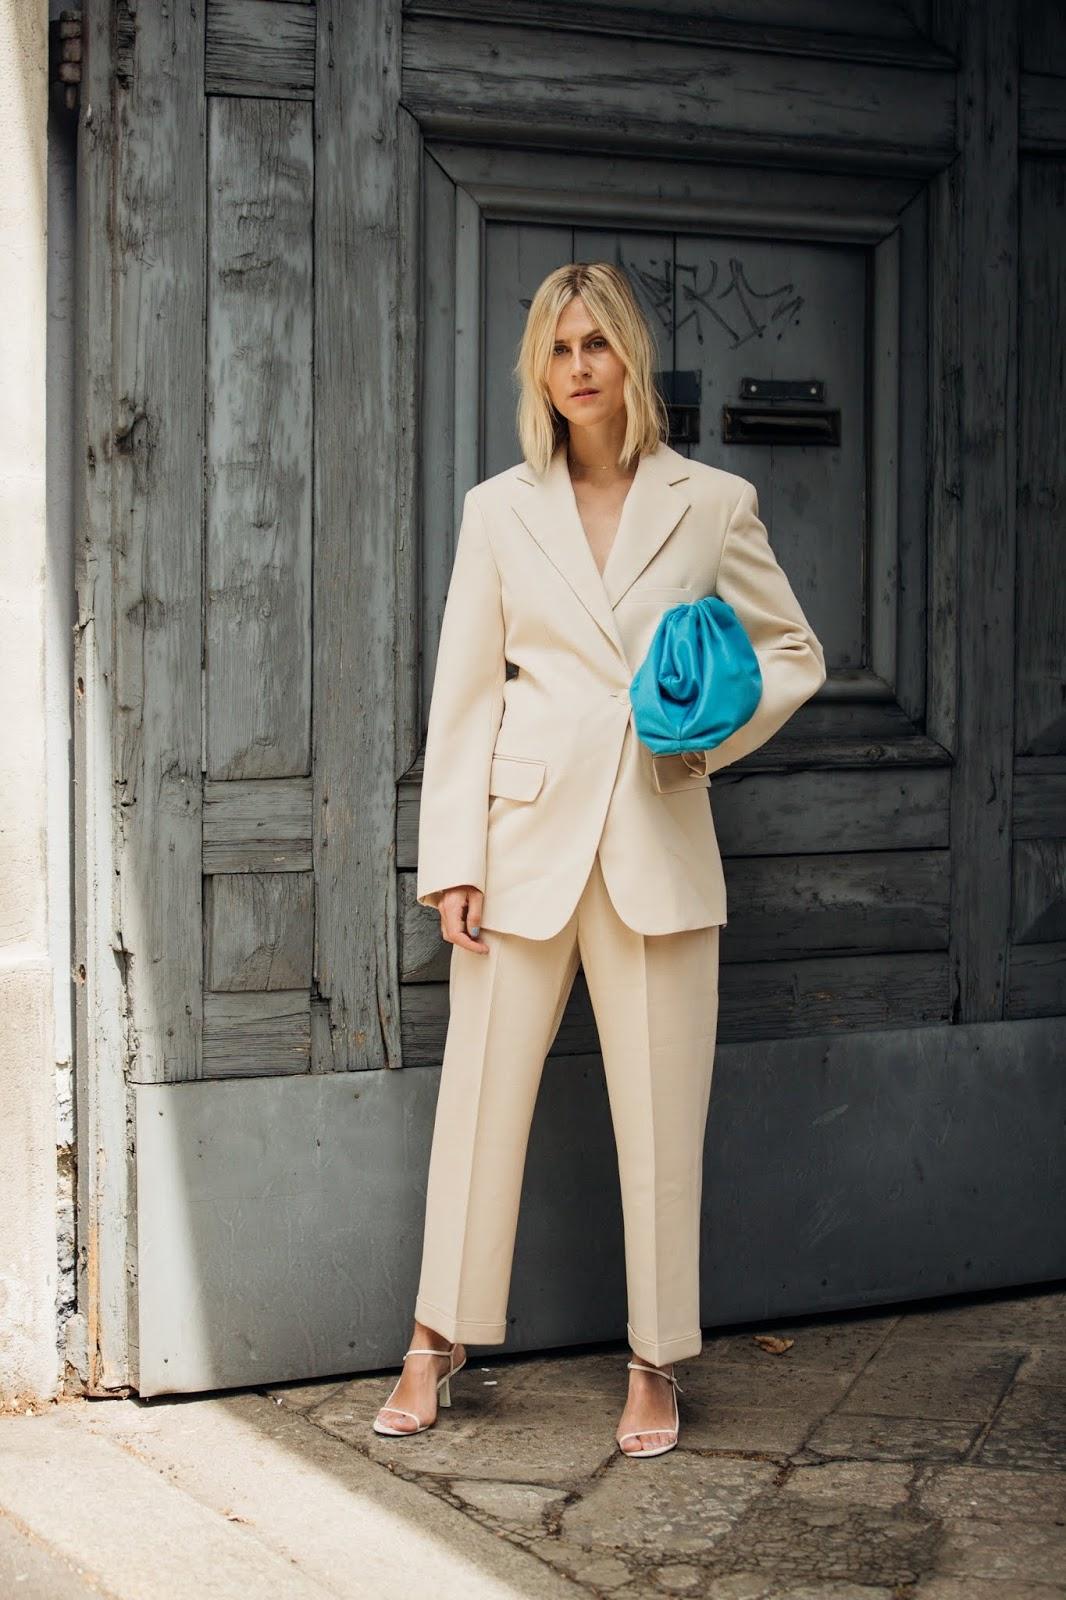 Top 5 Fashionable Handbags 2020 Worth Investing